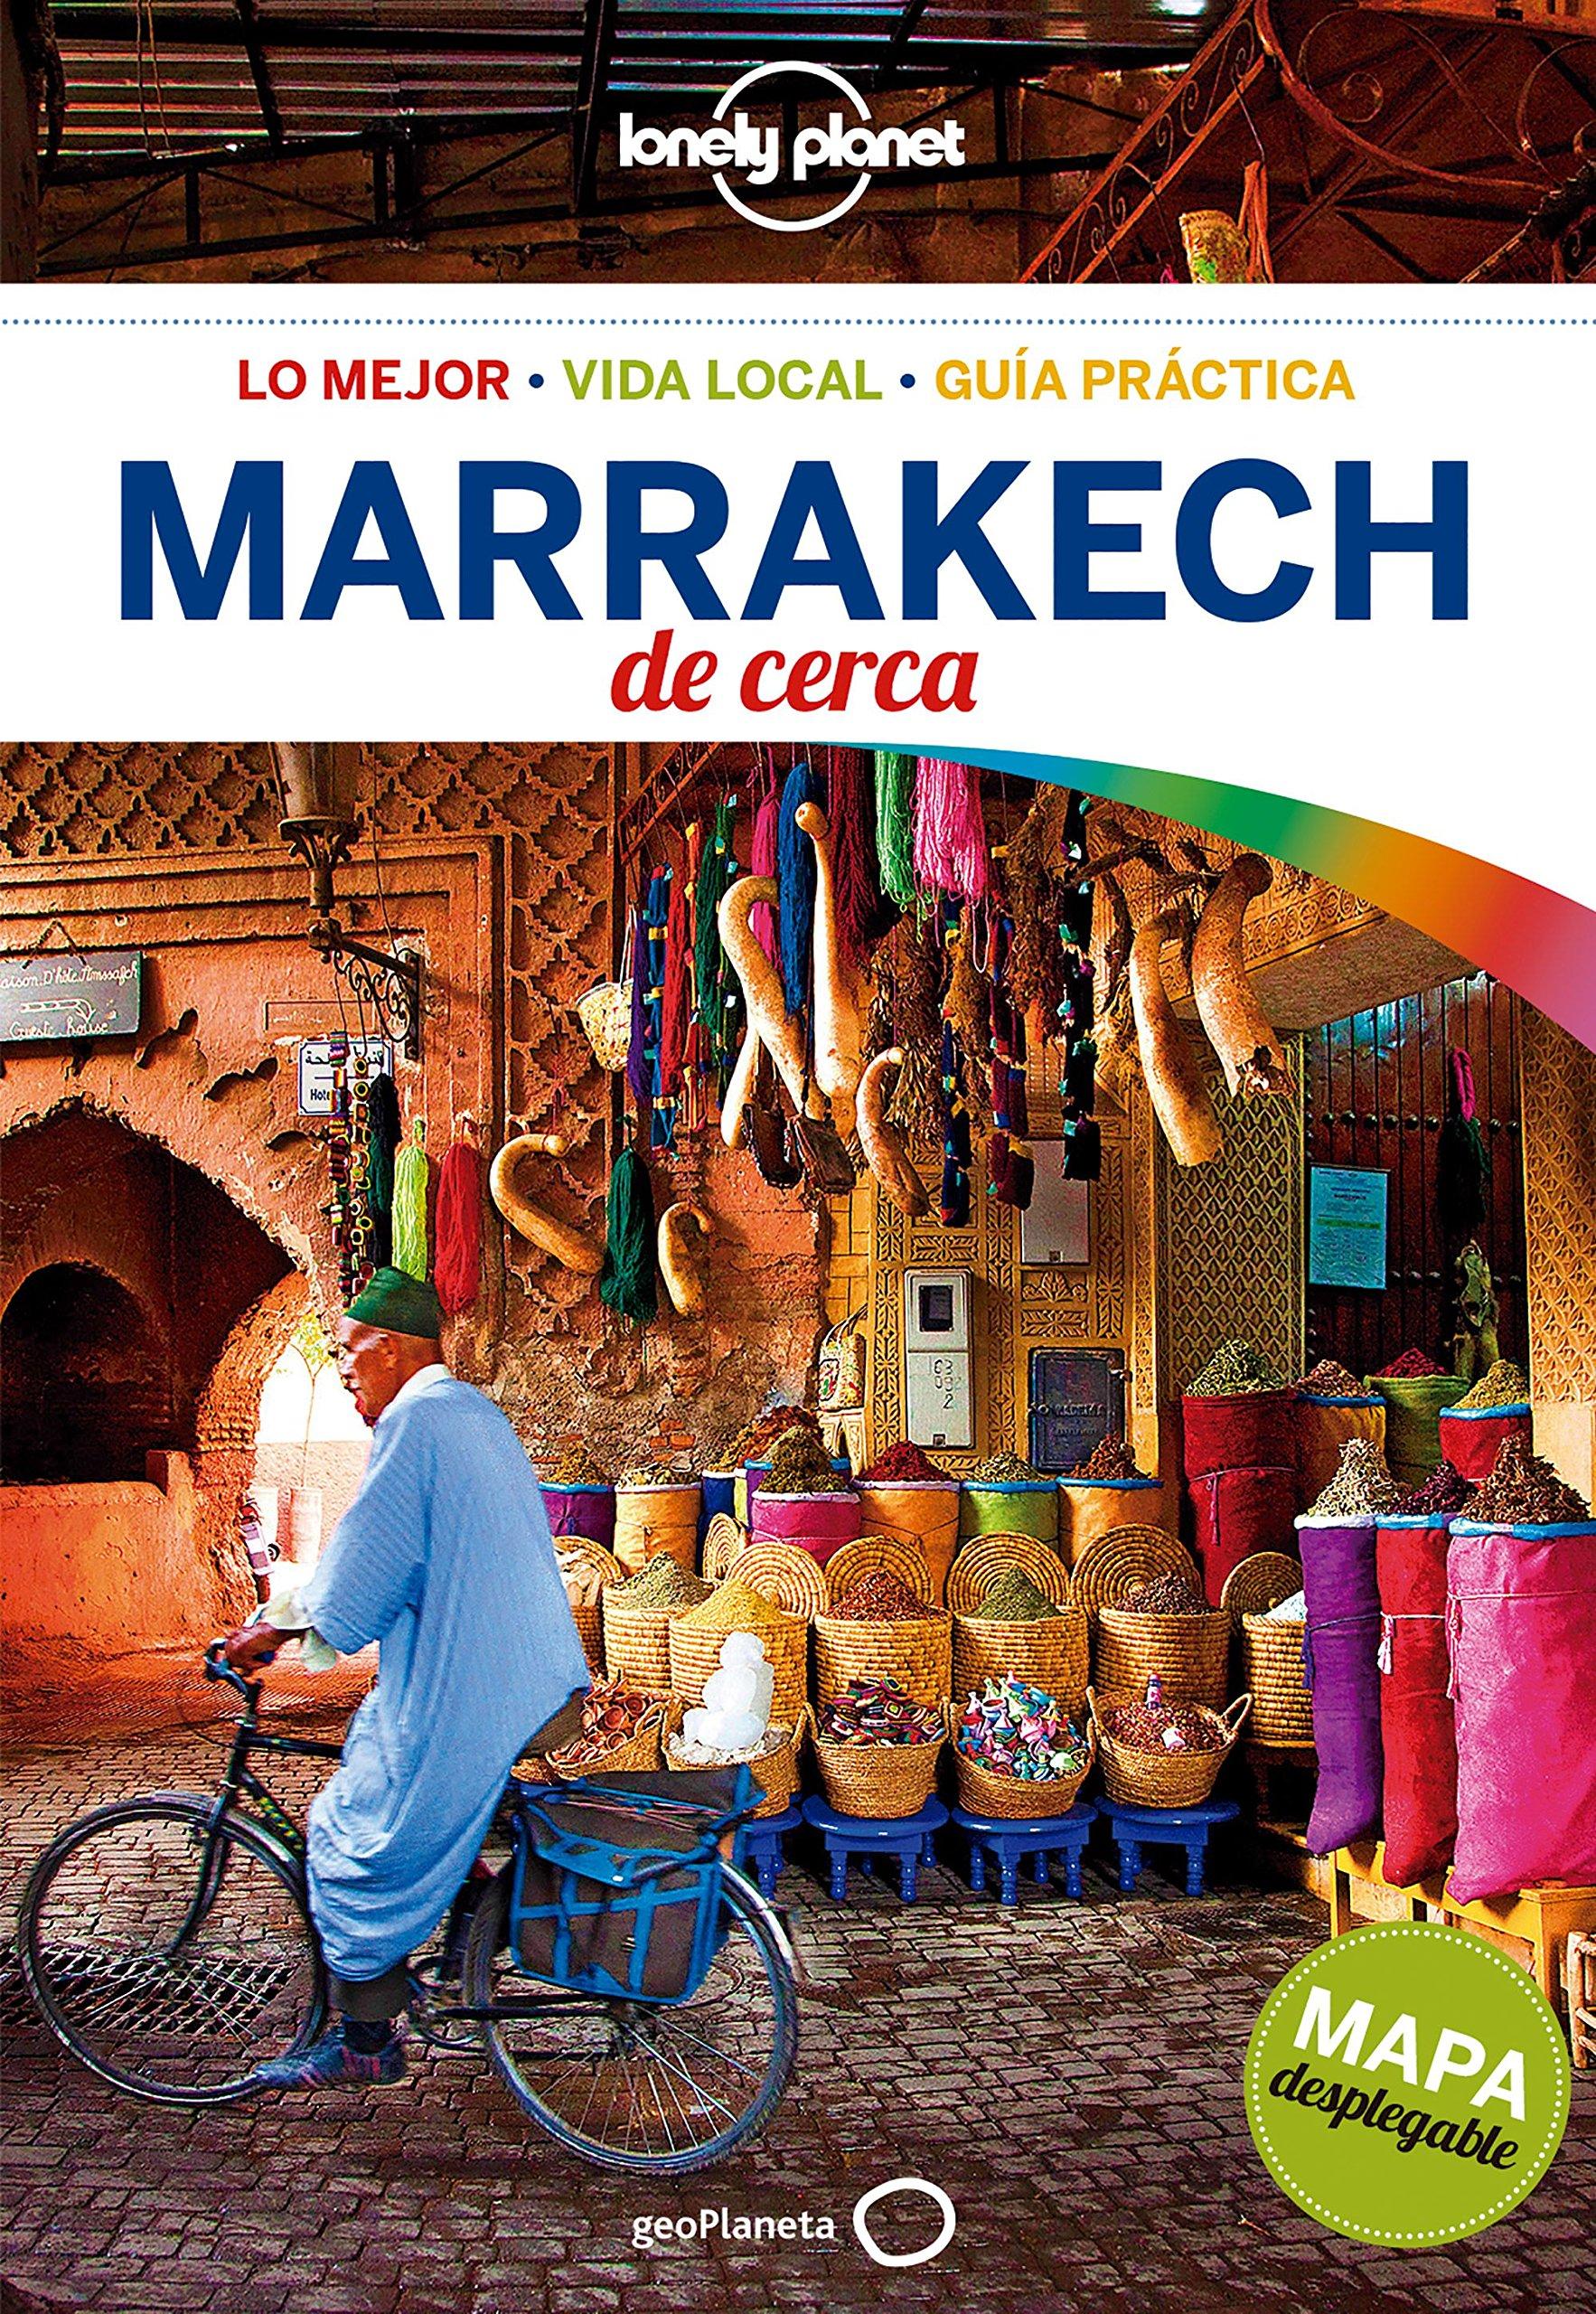 Marrakech de cerca (Guías De cerca Lonely Planet) Tapa blanda – 19 sep 2017 Jessica Lee Jaume Muñoz Cunill GeoPlaneta 840817469X